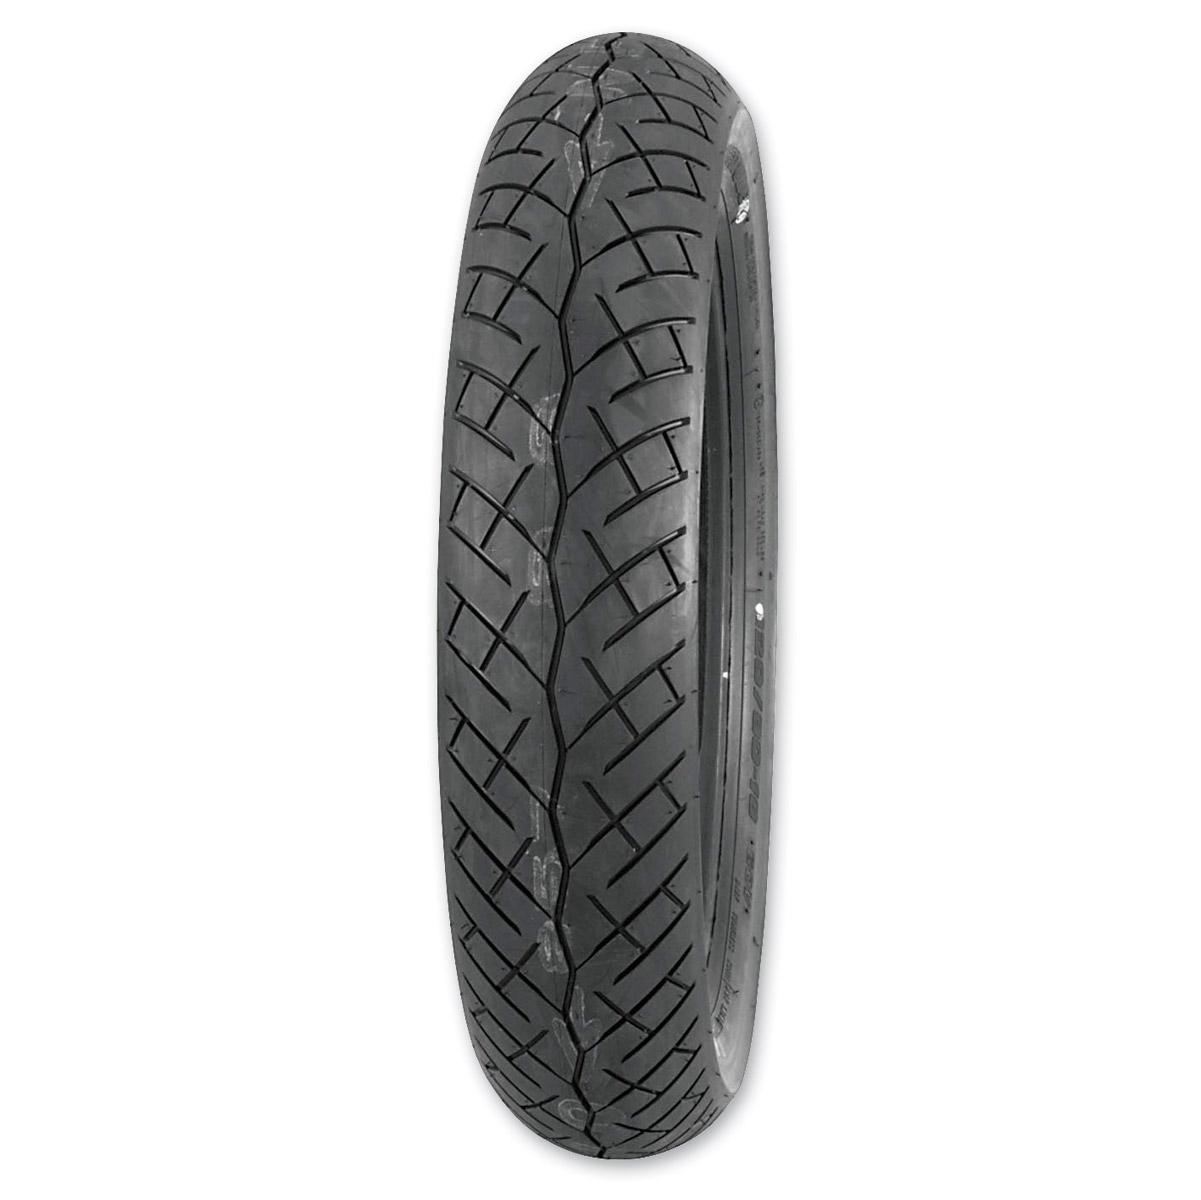 Bridgestone Battlax BT-45V 110/90V-16 Front Tire - 072443